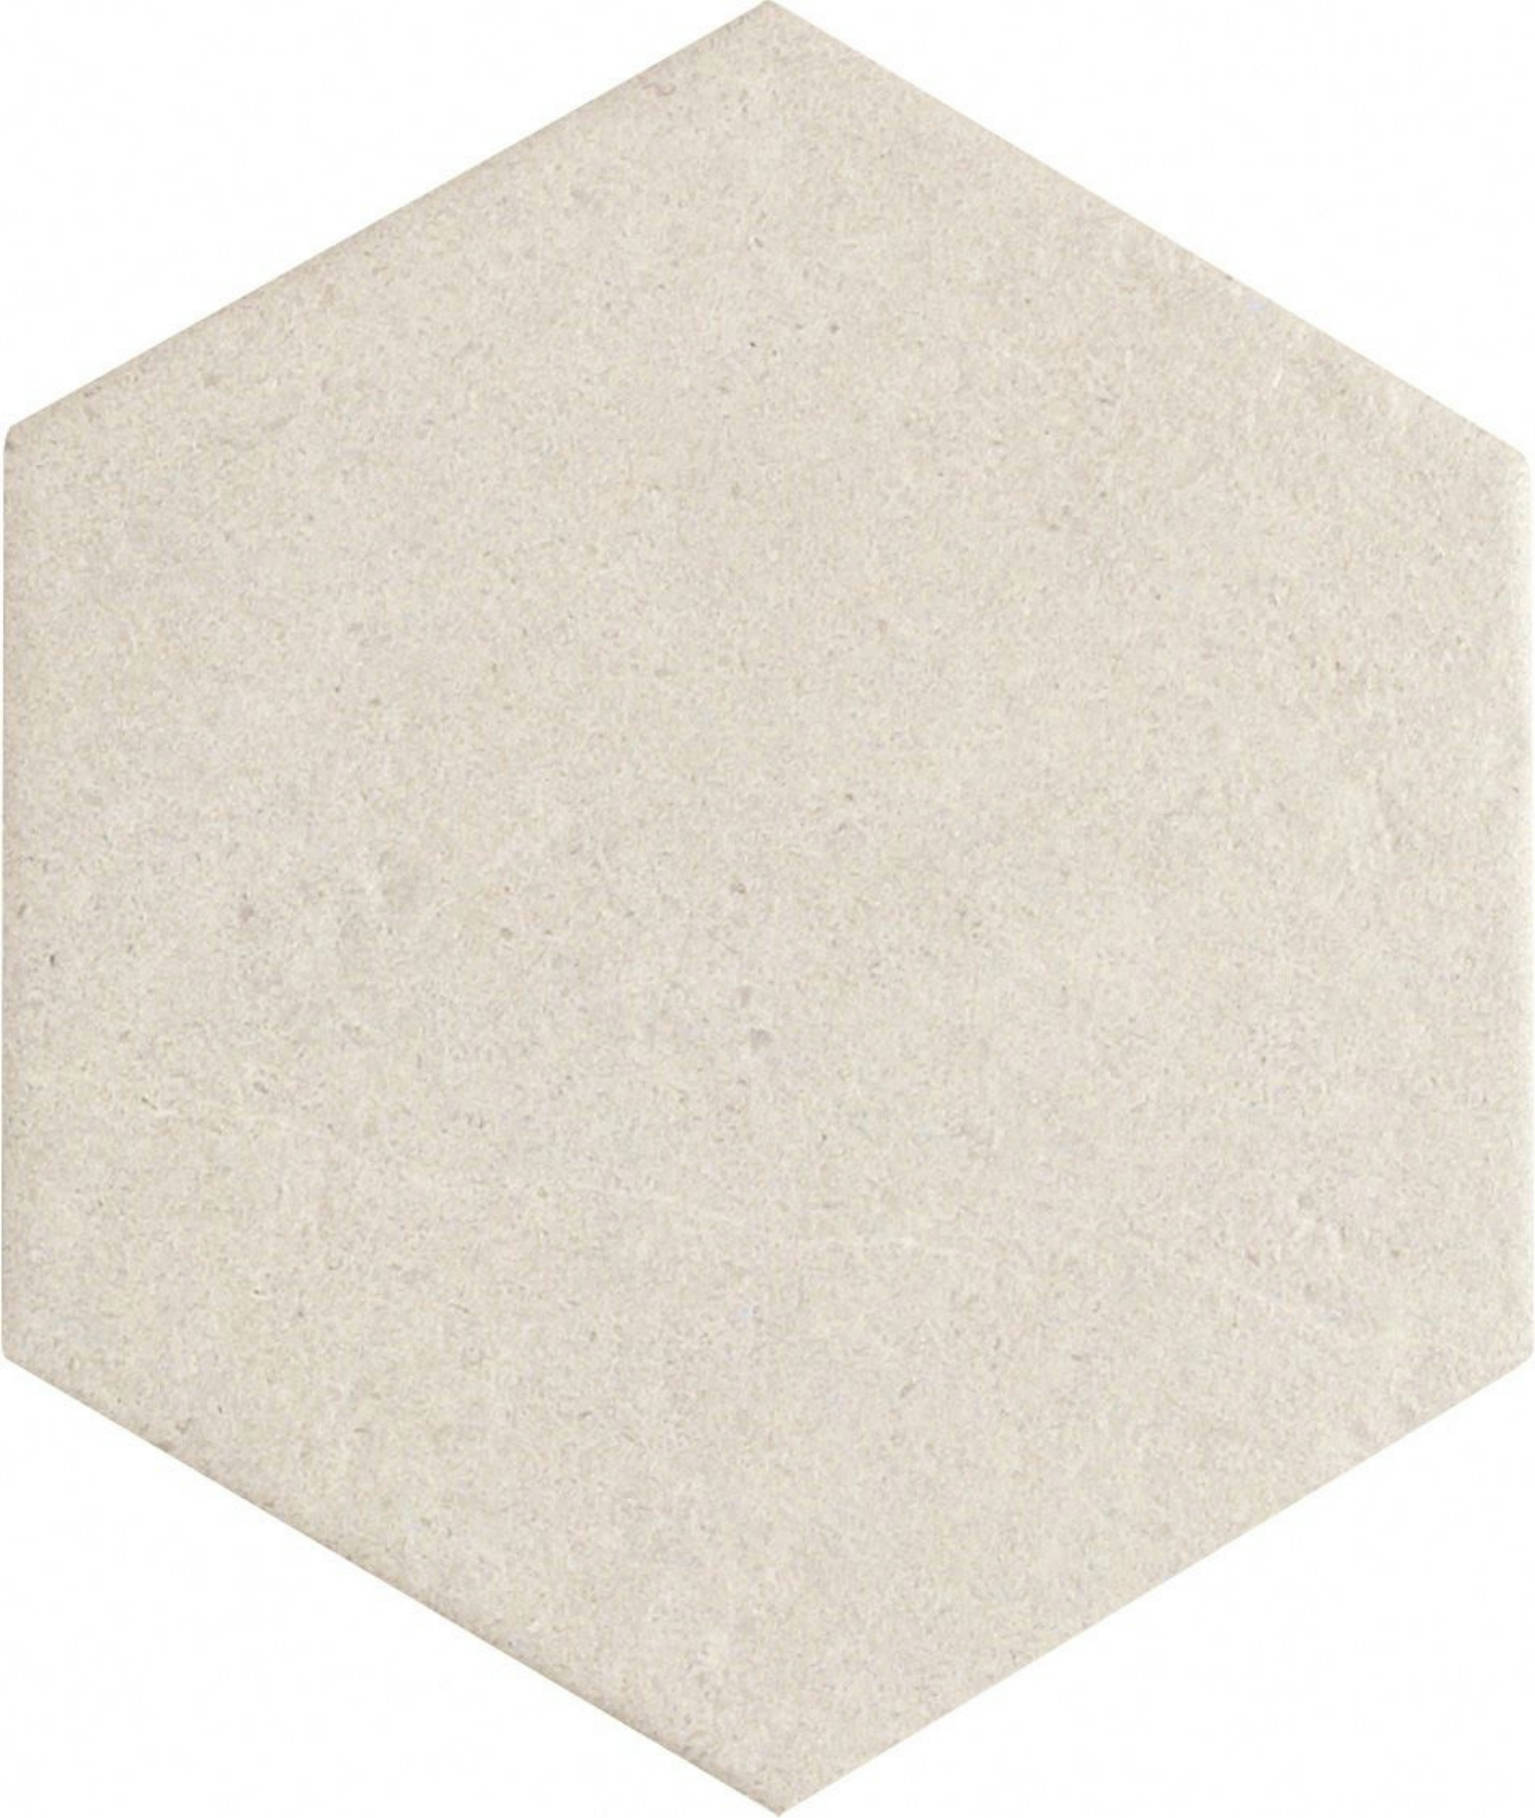 Qstone Ivory 14x16   Newker